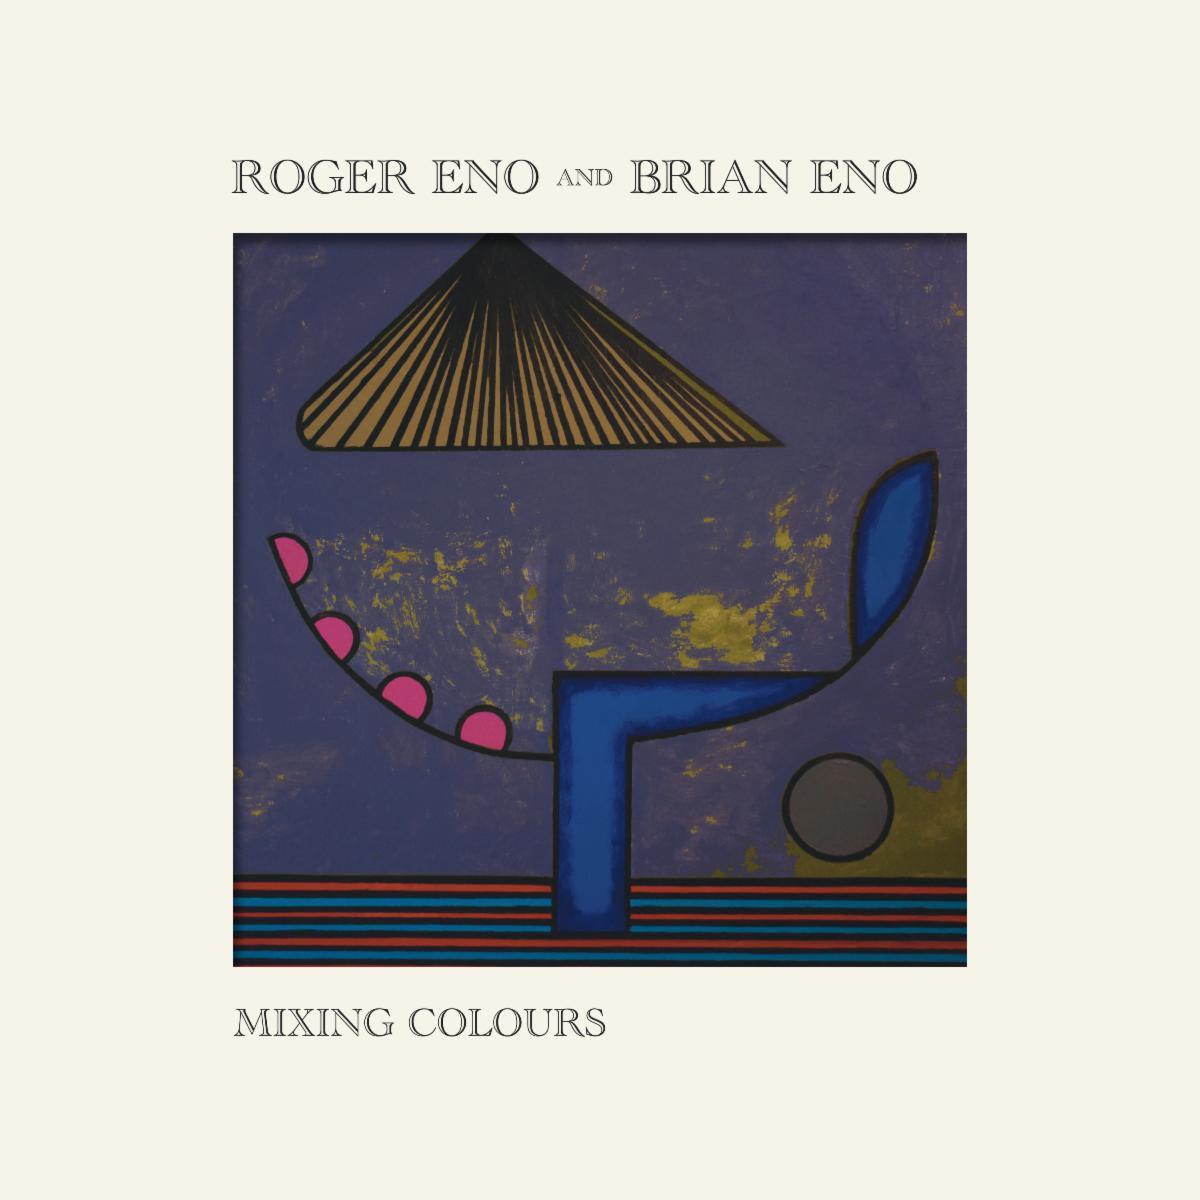 Brian Roger Eno Mixing Colours album cover artowrk